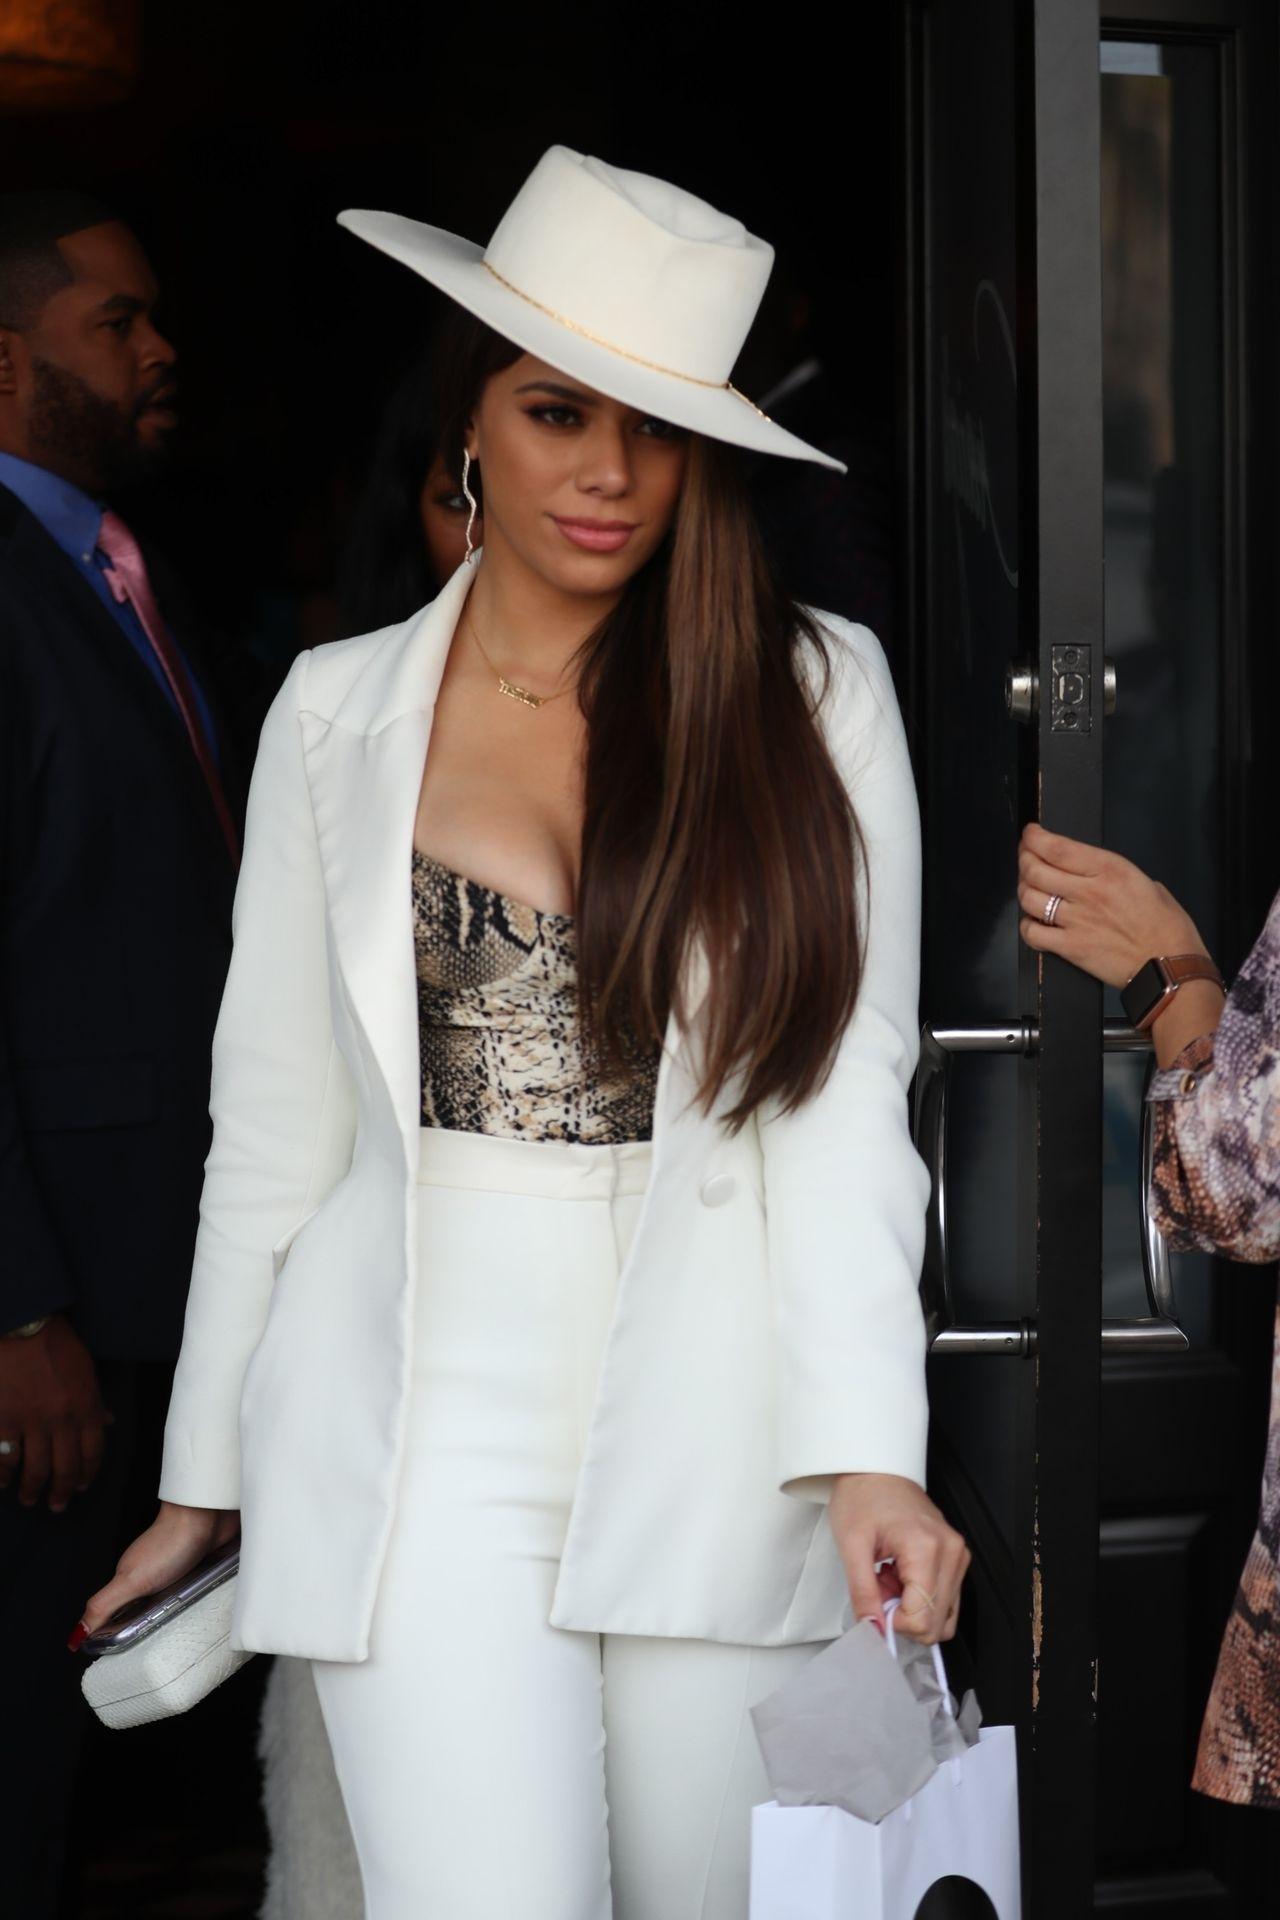 Dinah Jane Departs The Women In Harmony Pre Grammy Luncheon 0024